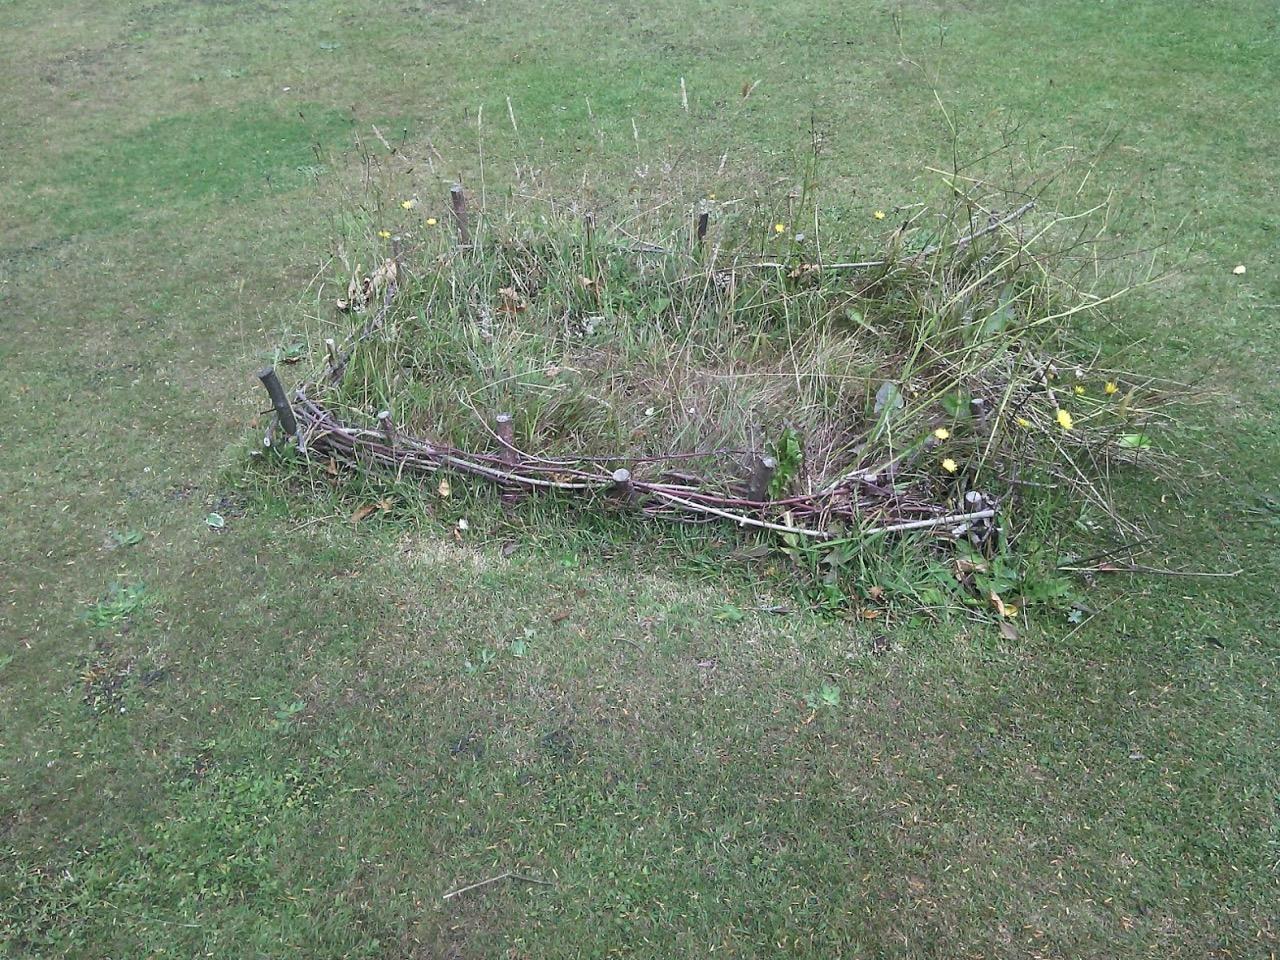 The lawn plot